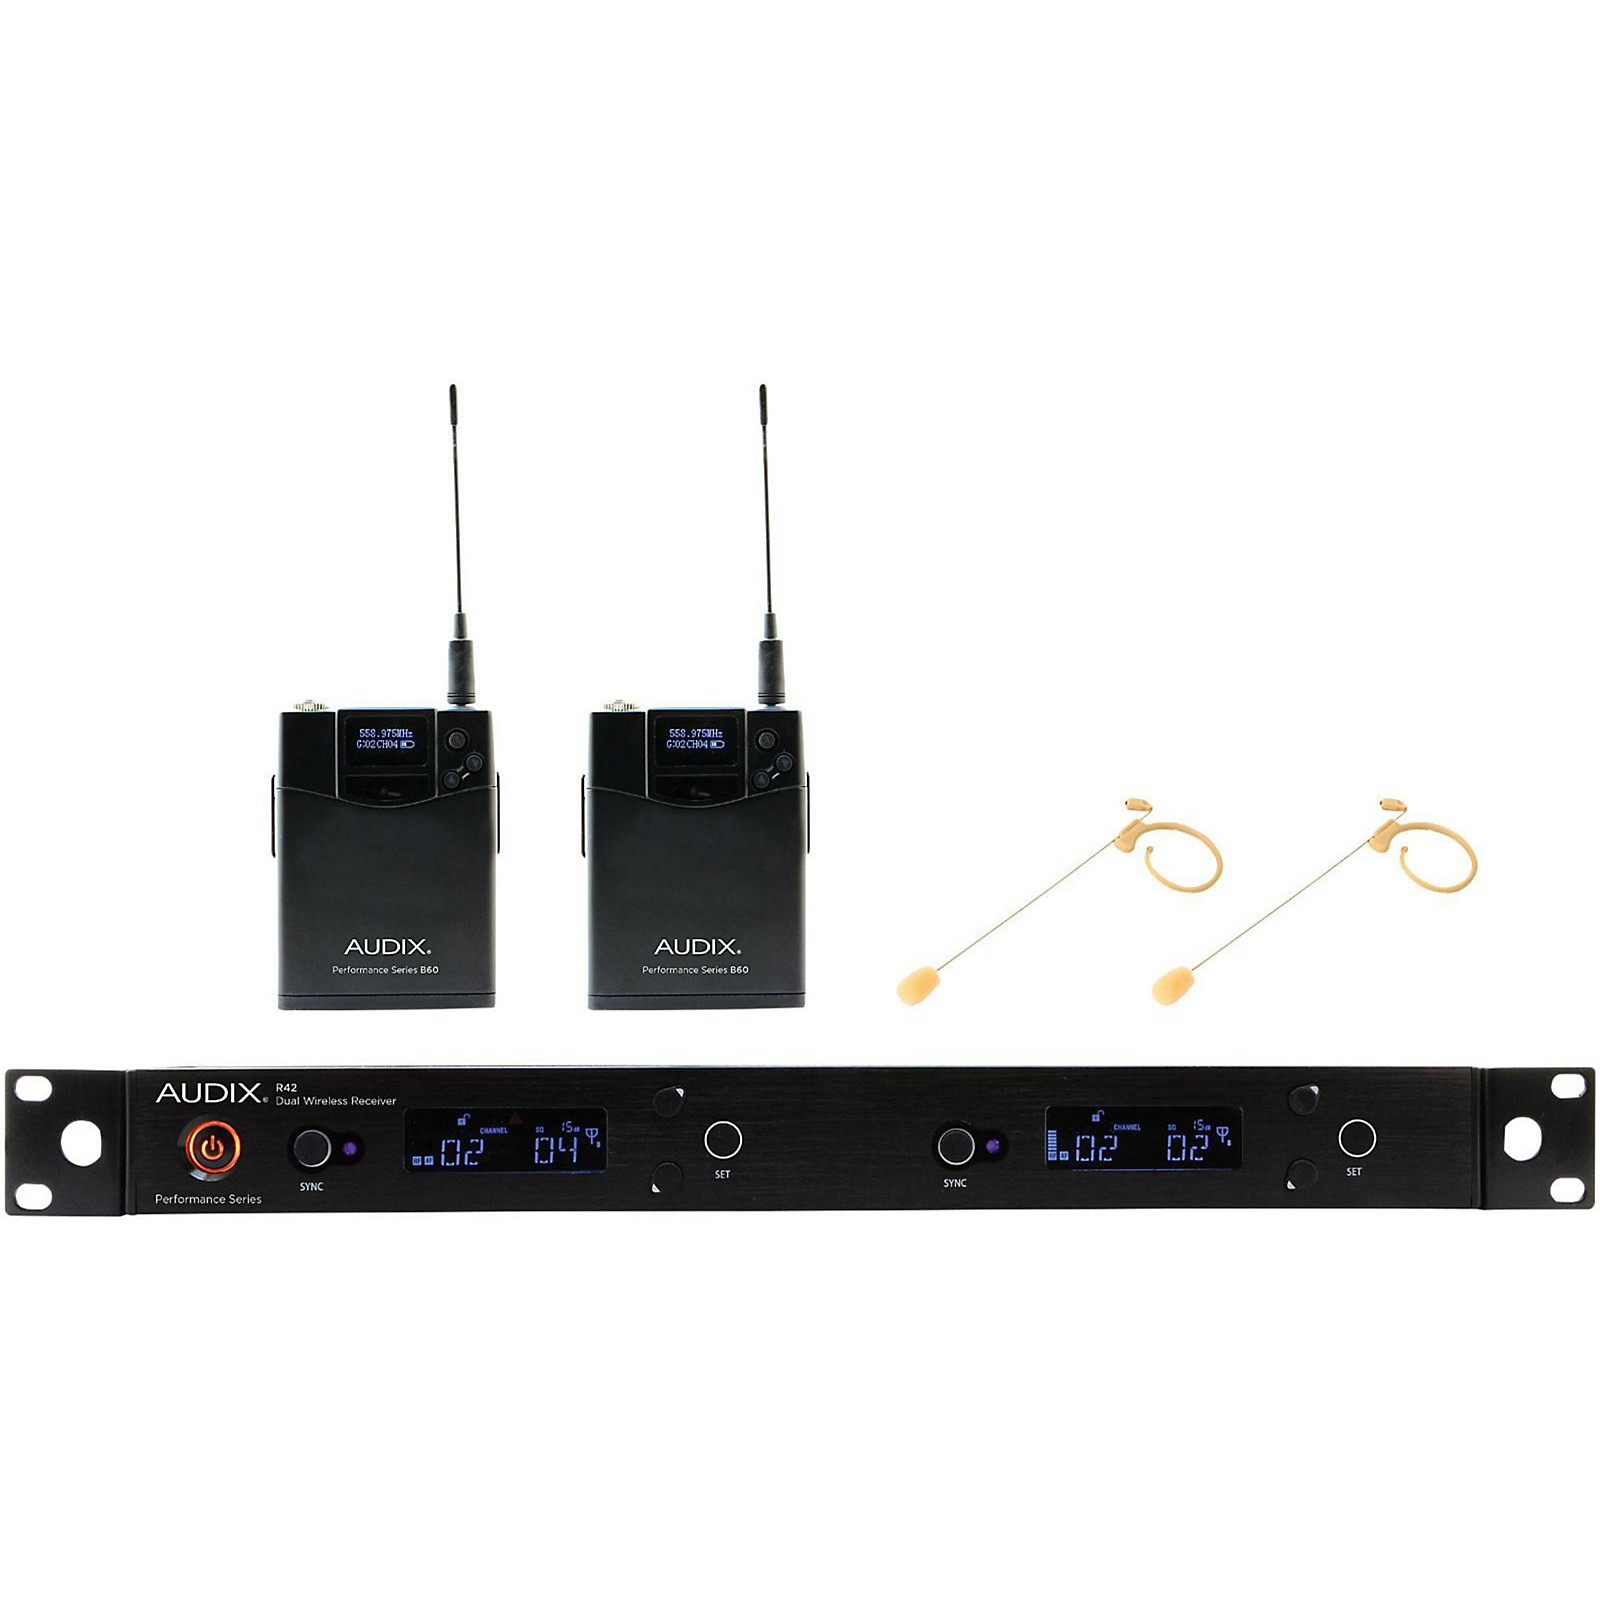 Audix AP42 HT7BG Dual Headset Wireless System - Beige Restock